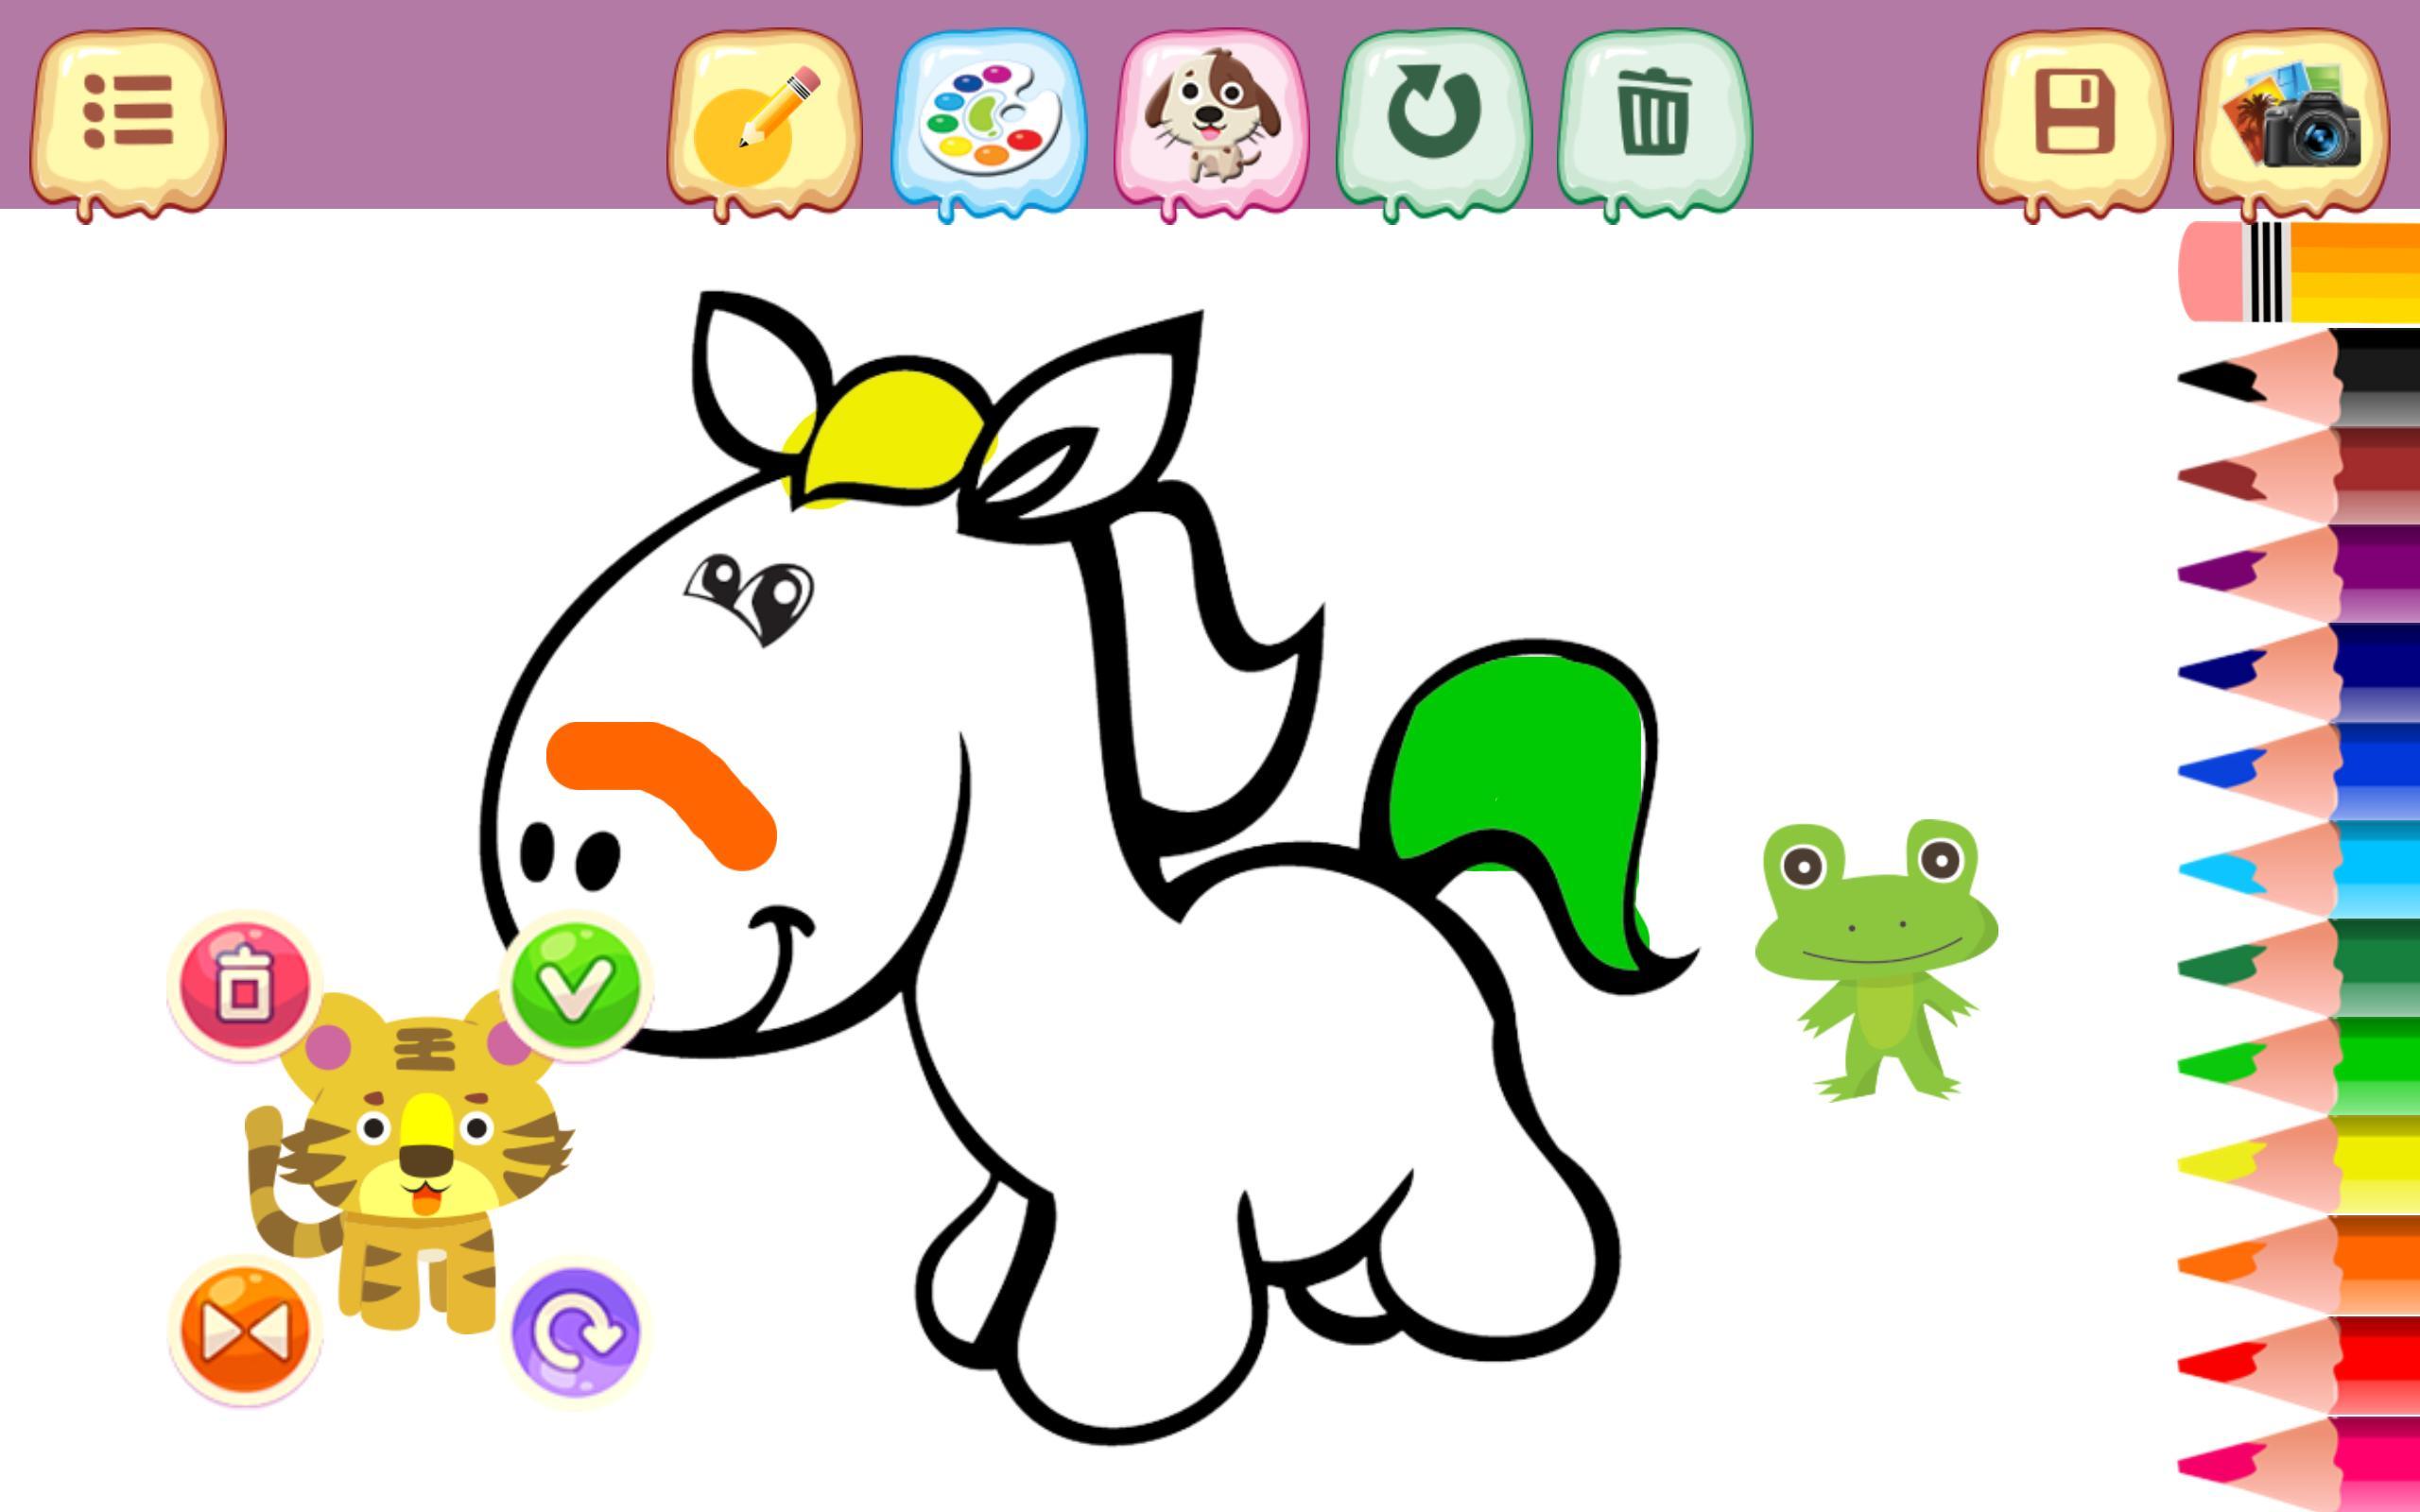 Android Icin Kucuk Pony Boyama Kitabi Apk Yi Indir